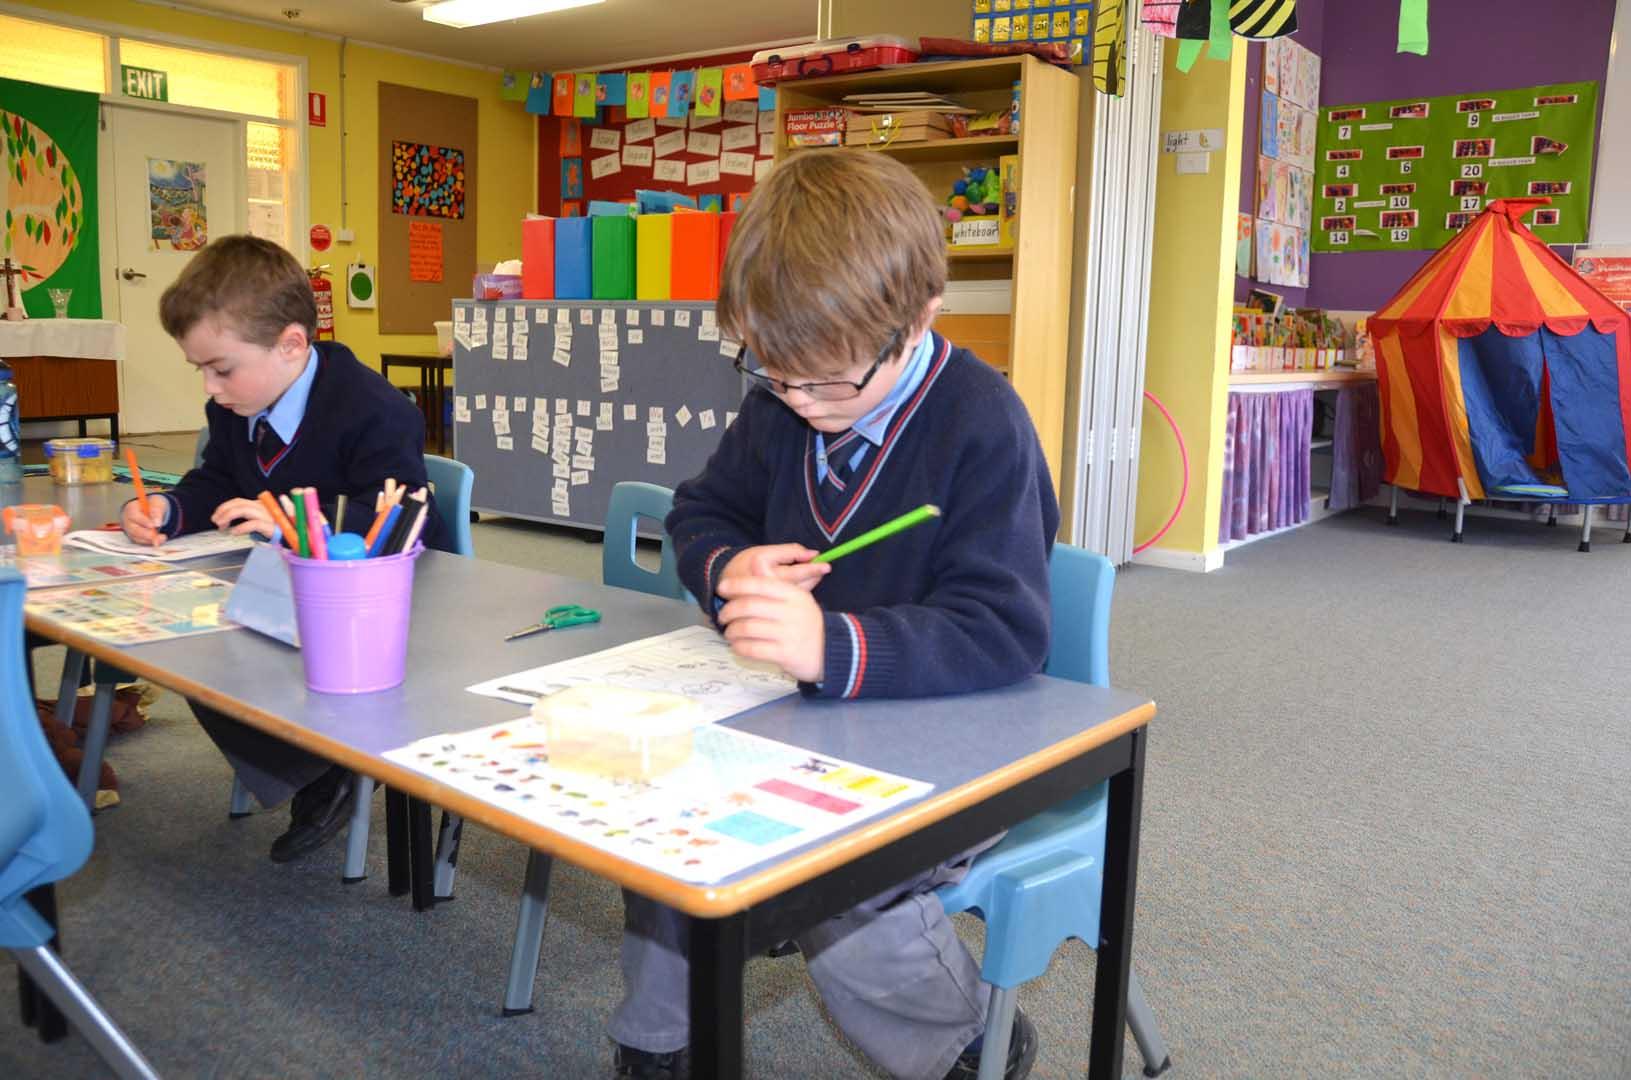 St-Patricks-walcha-classroom587